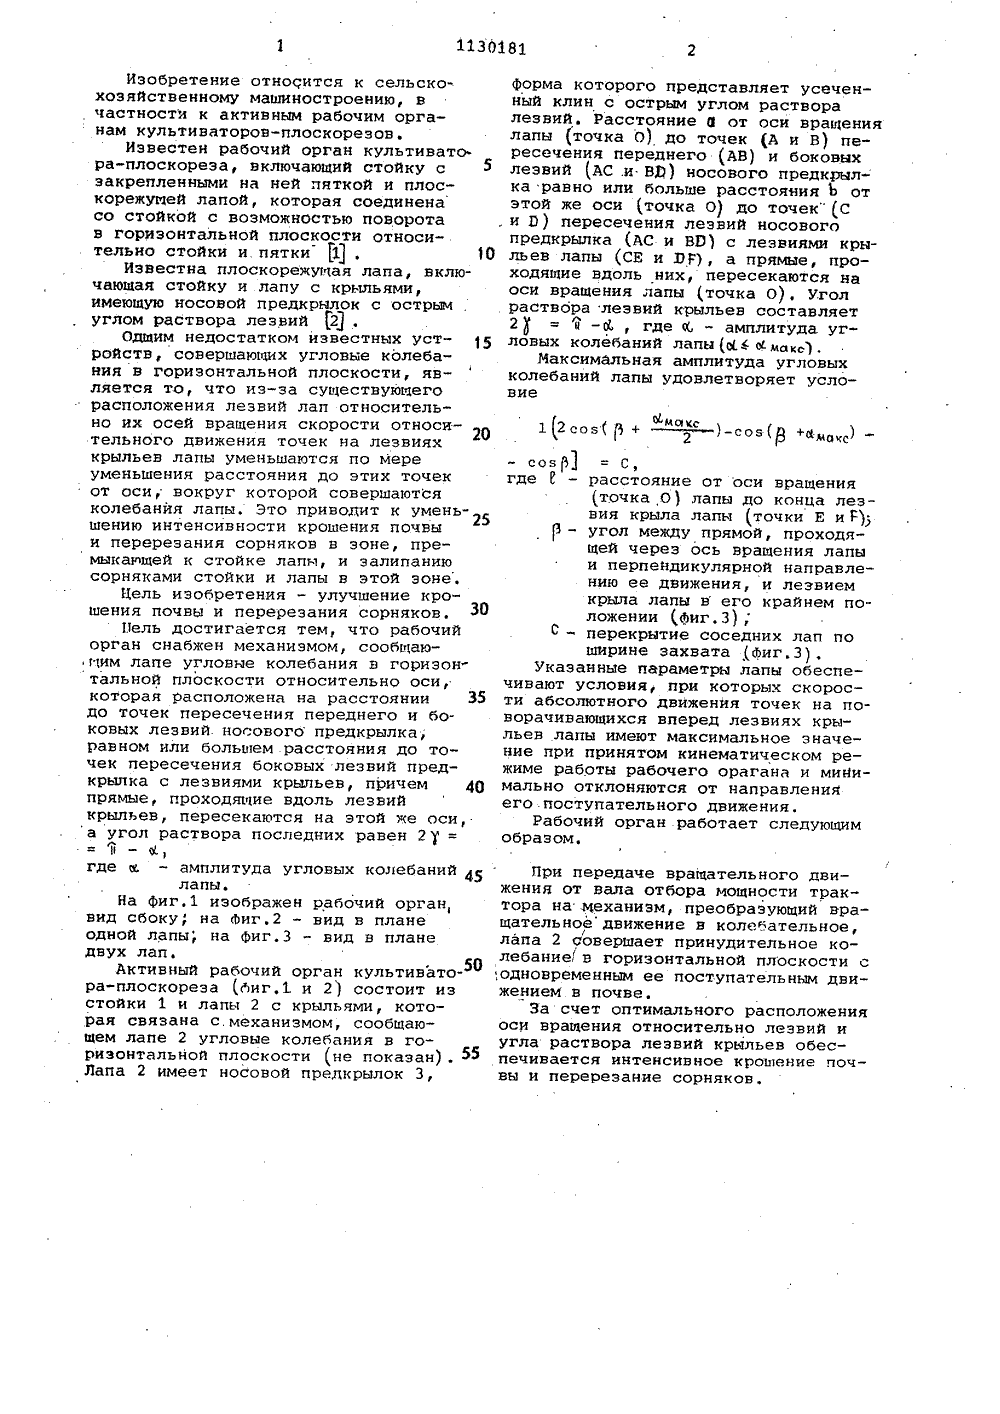 2-1130181-patentssu.png